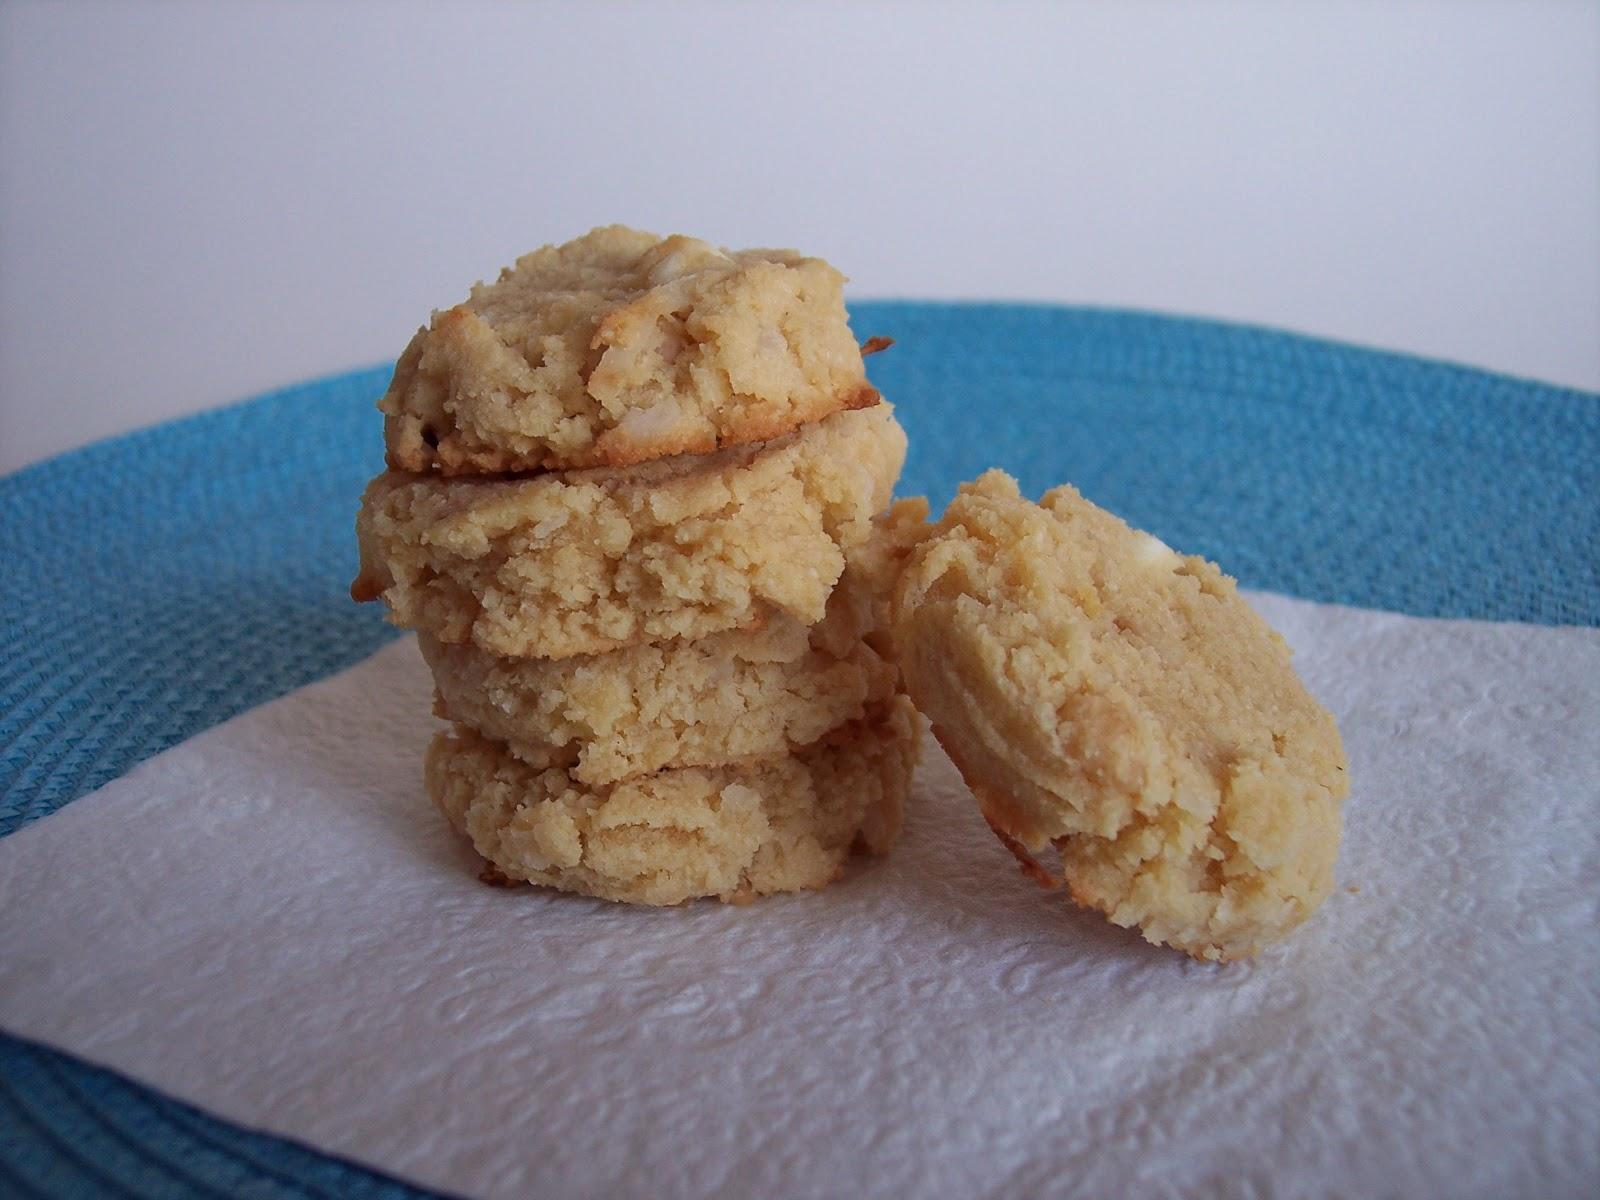 White chocolate macadamia nut cookies recipe in the for White chocolate macadamia nut cookies recipe paula deen